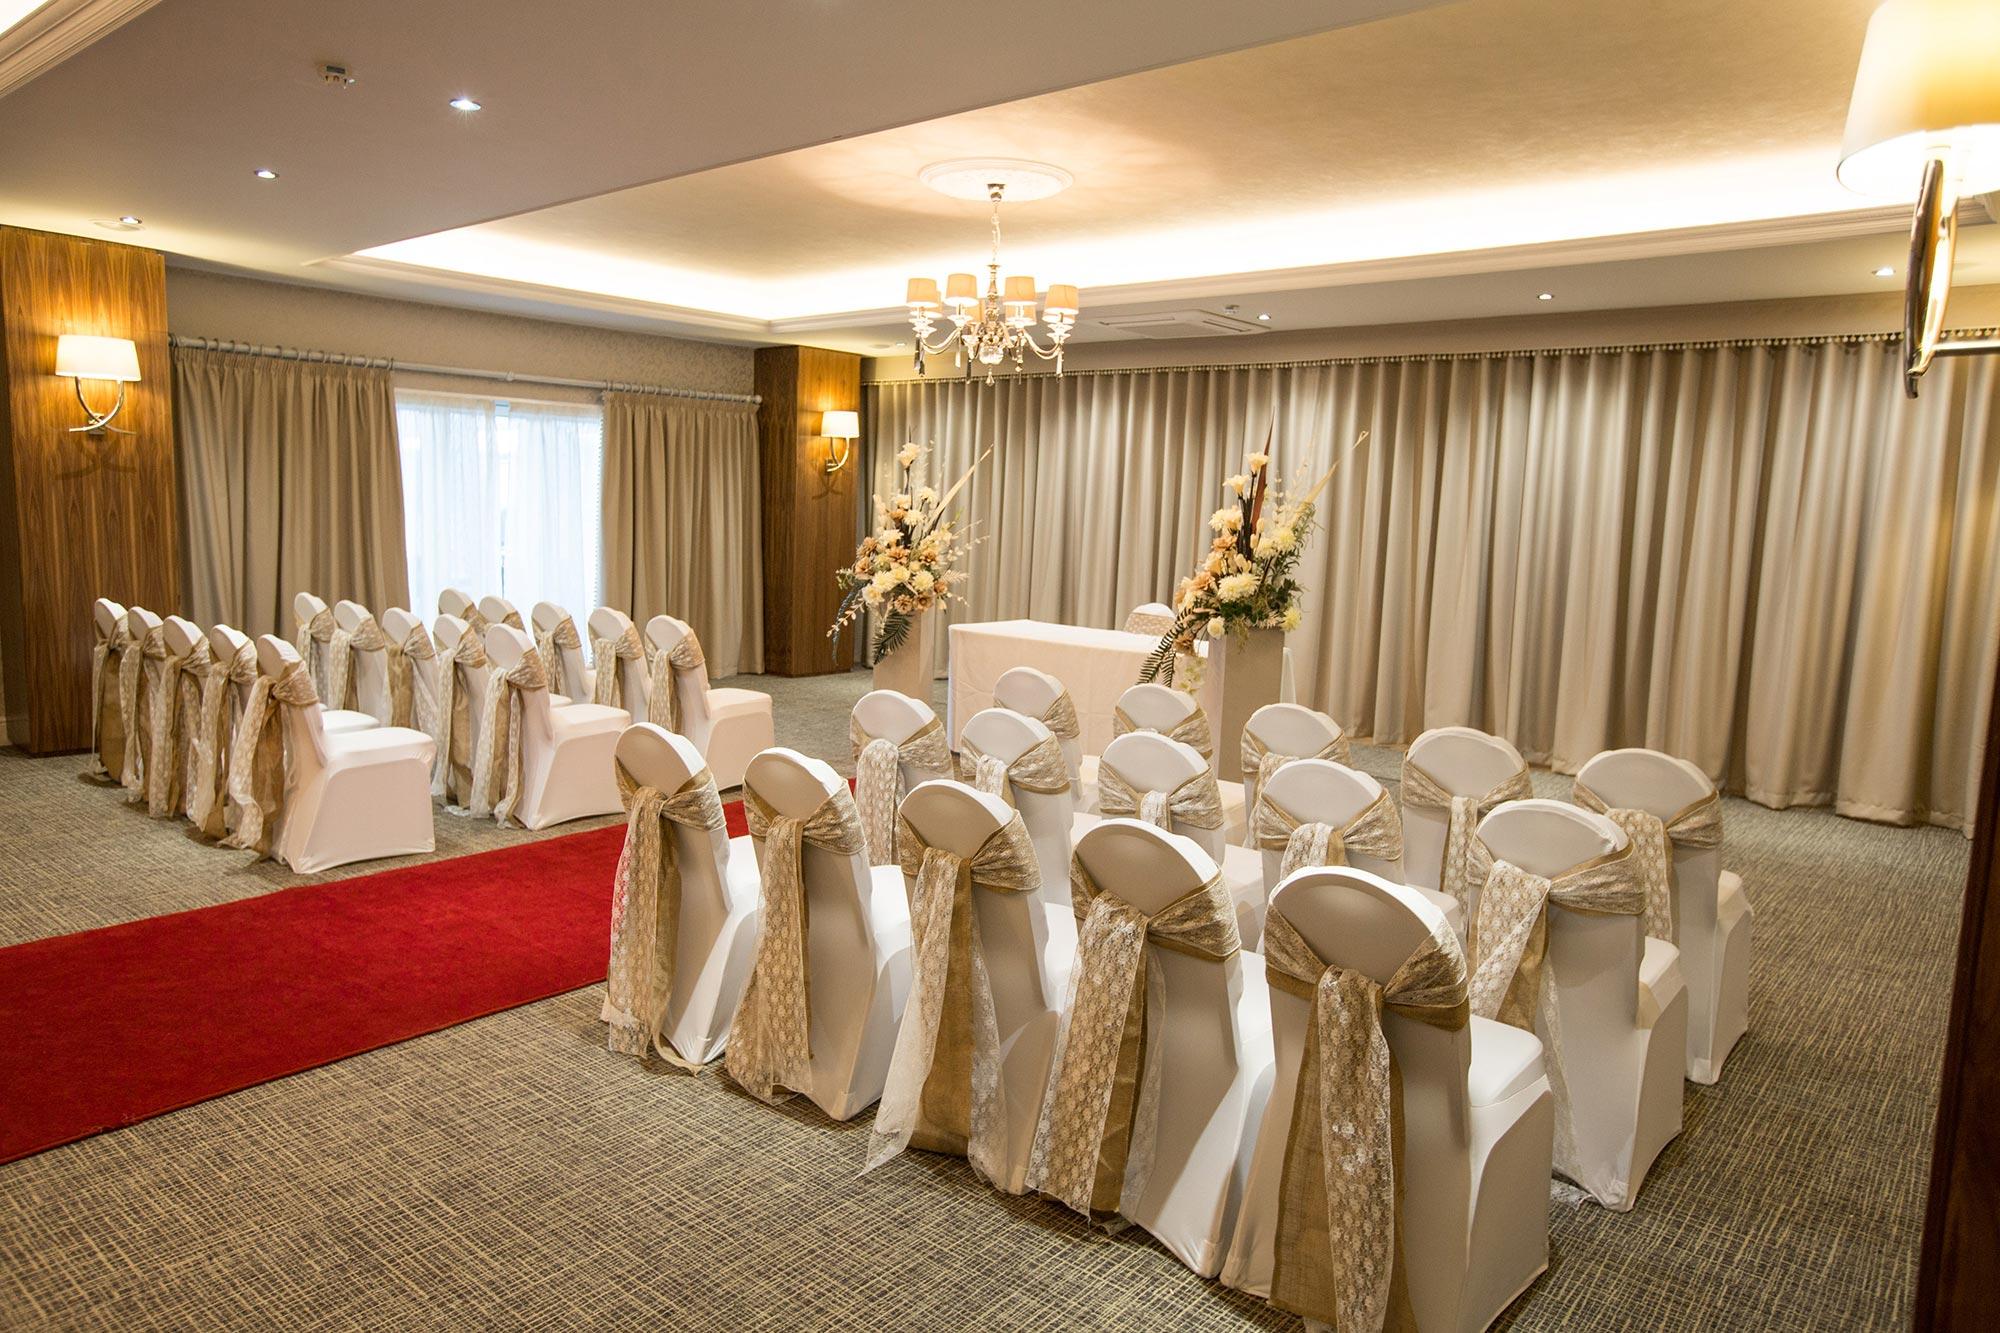 Horsley-Lodge-Function-Wedding-Conference-(3)